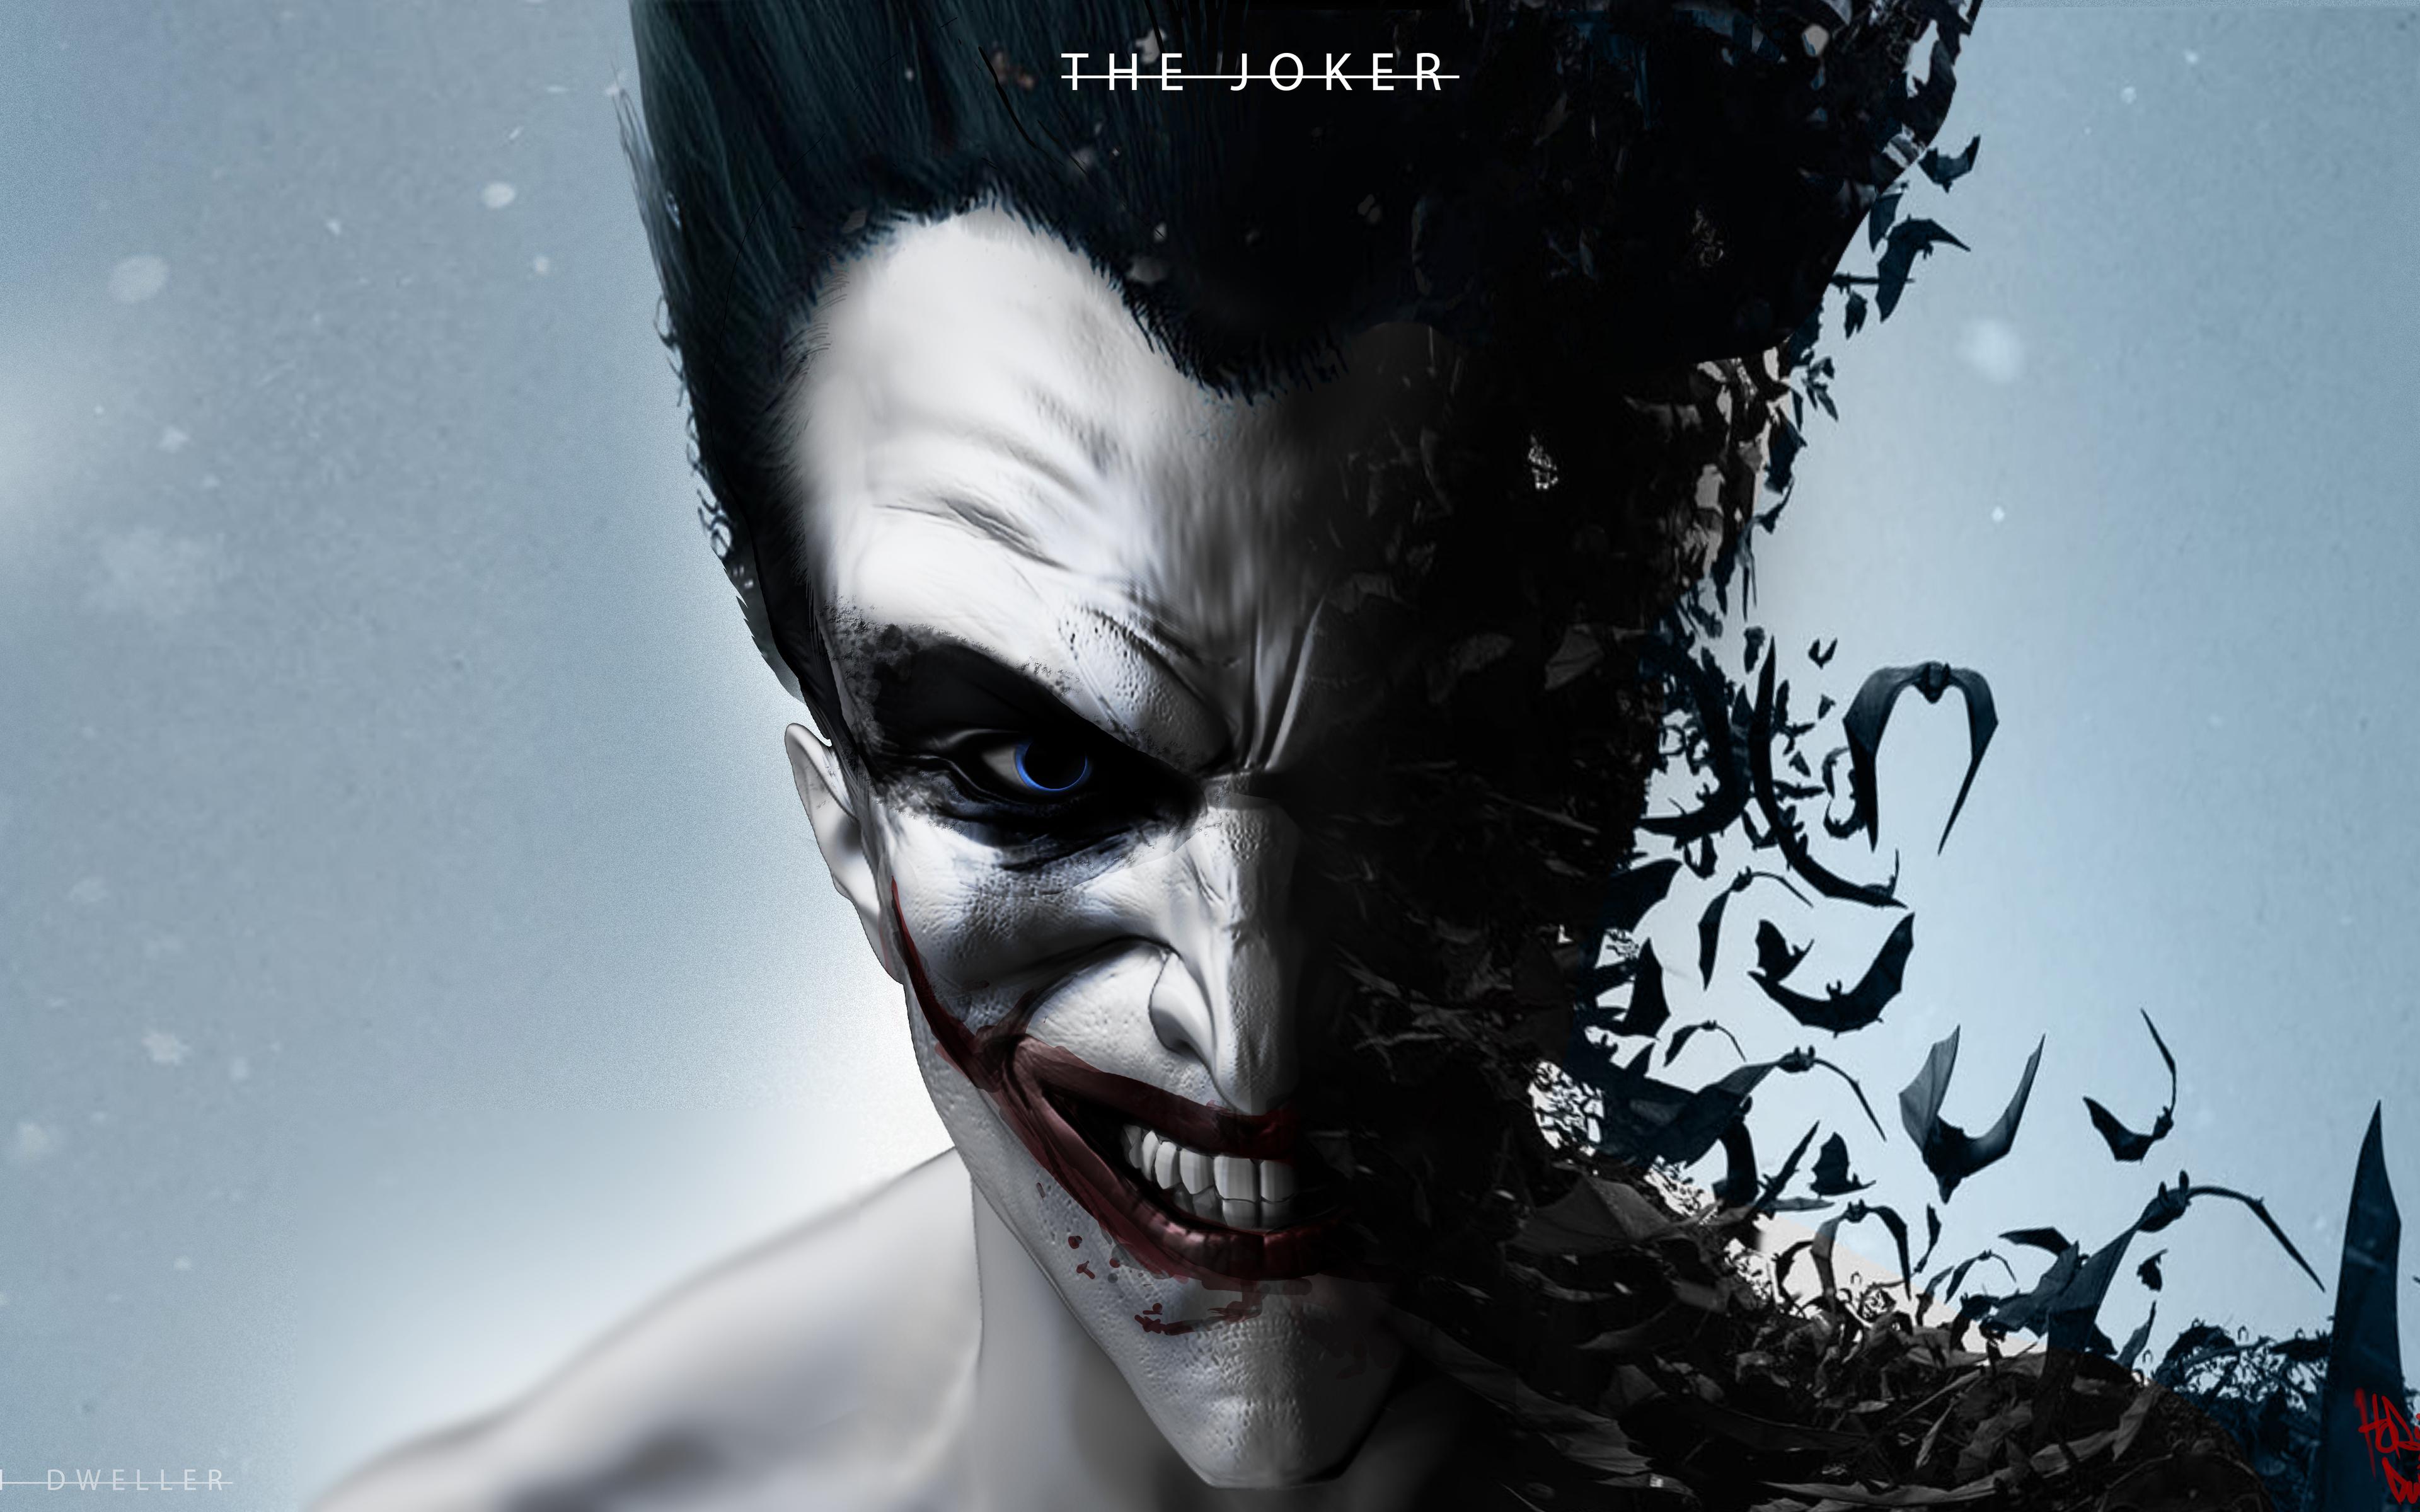 3840x2400 The Joker 4k HD 4k Wallpapers, Images ...